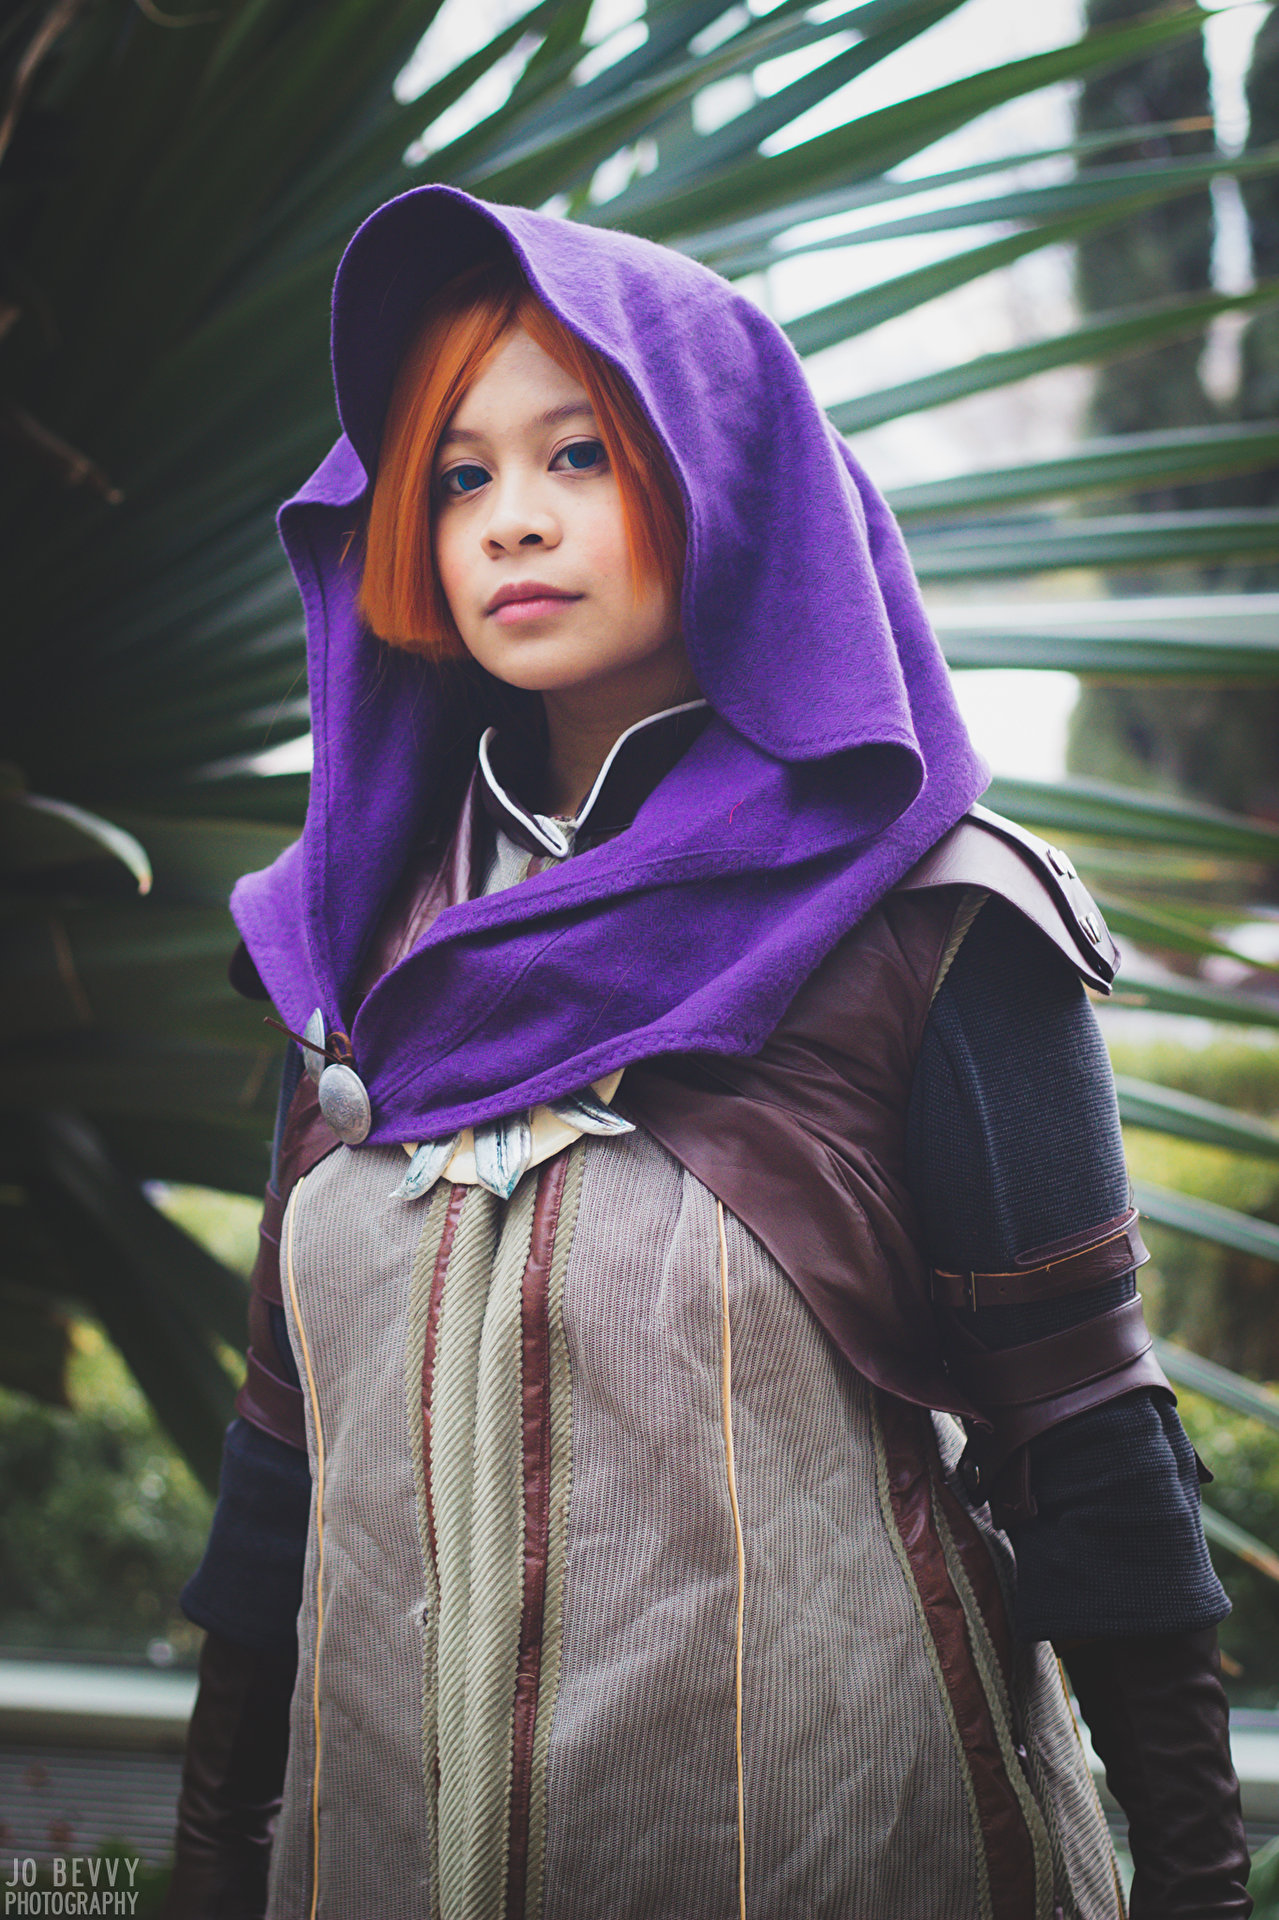 Leliana (Dragon Age: Inquisition) photo: JoBevvy